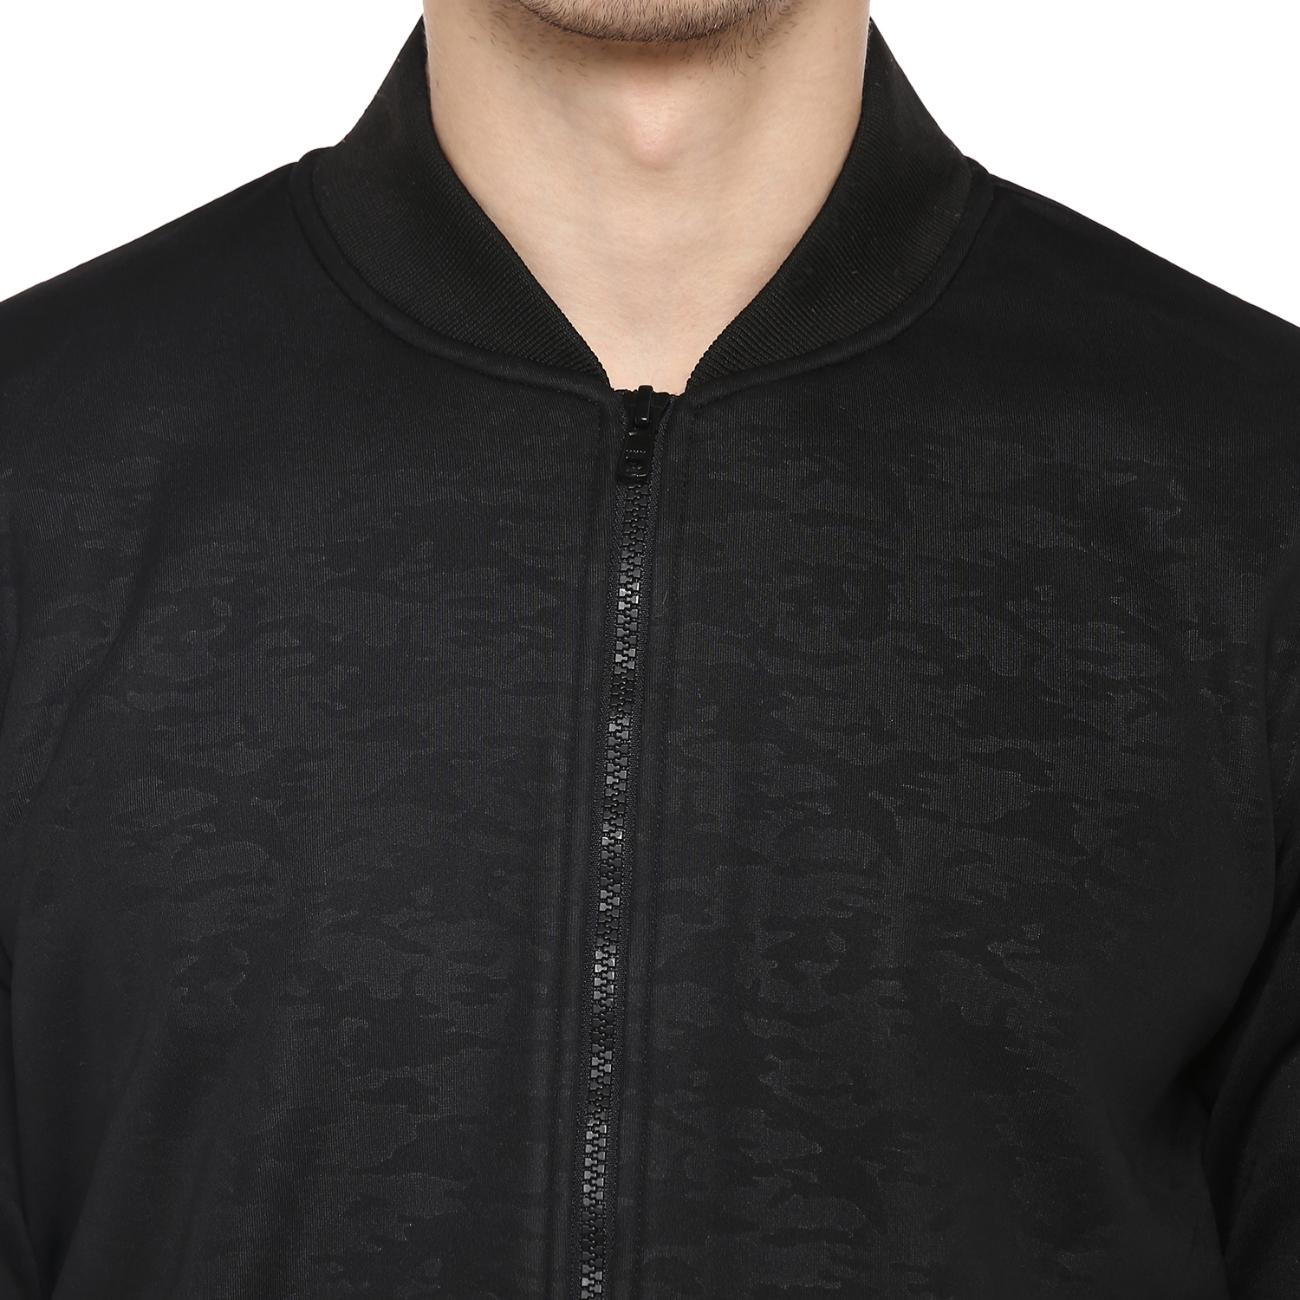 Black Bomber Jacket for Men Online